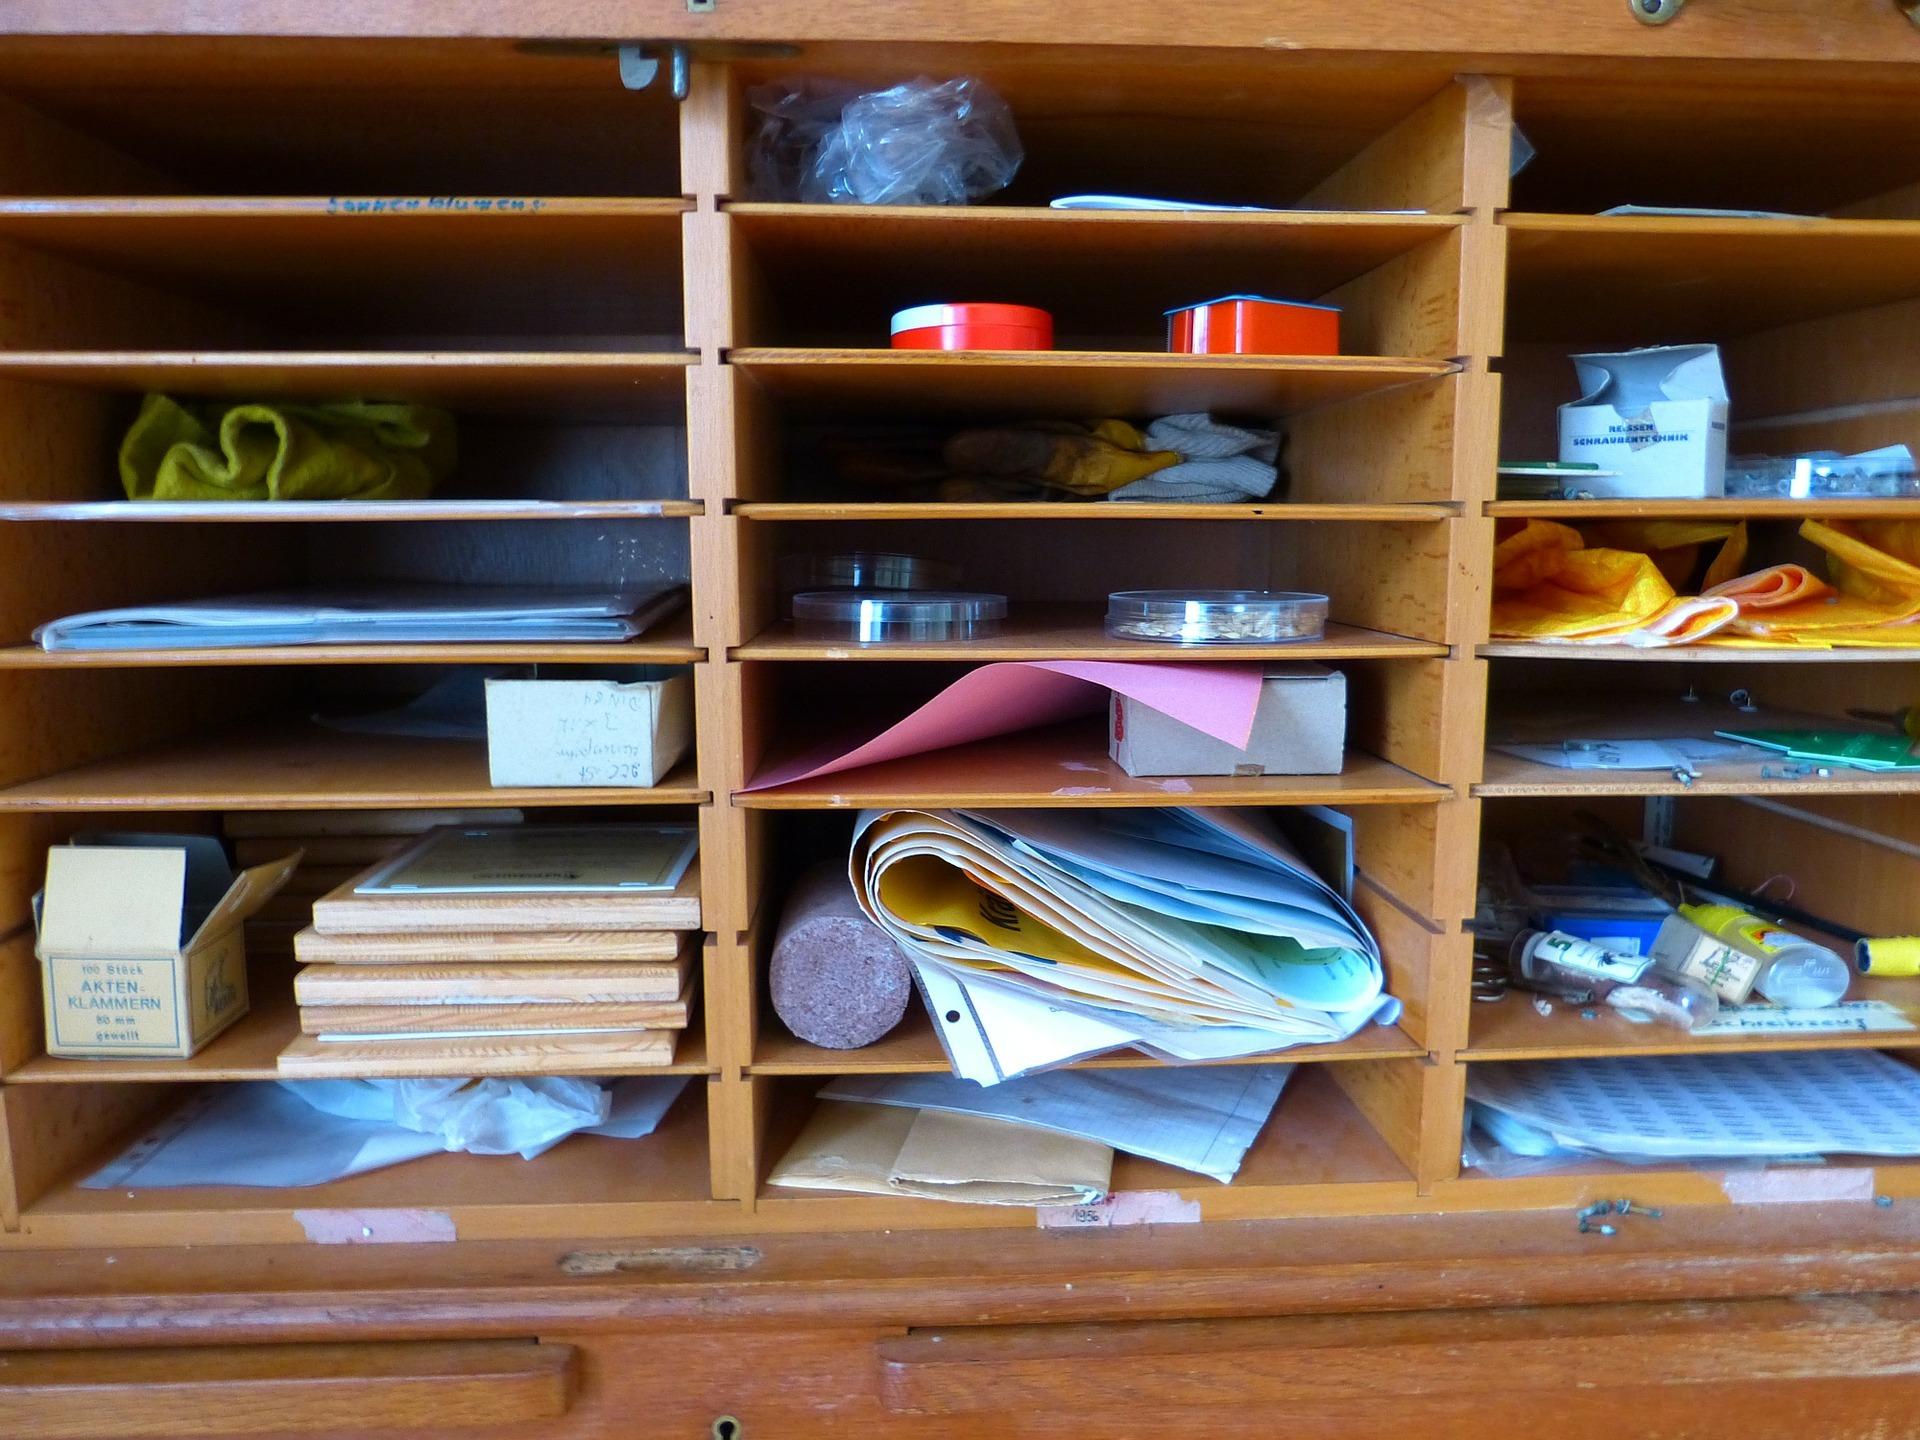 Atas Meja Sabuk Laci Menyusun Rak Barang Kecil Buku Daftar Bulang Lemari Kayu Jati Besi Desain Industrial Dekor Rumah Kafe Tips Rapikan Dengan Bahan Bekas